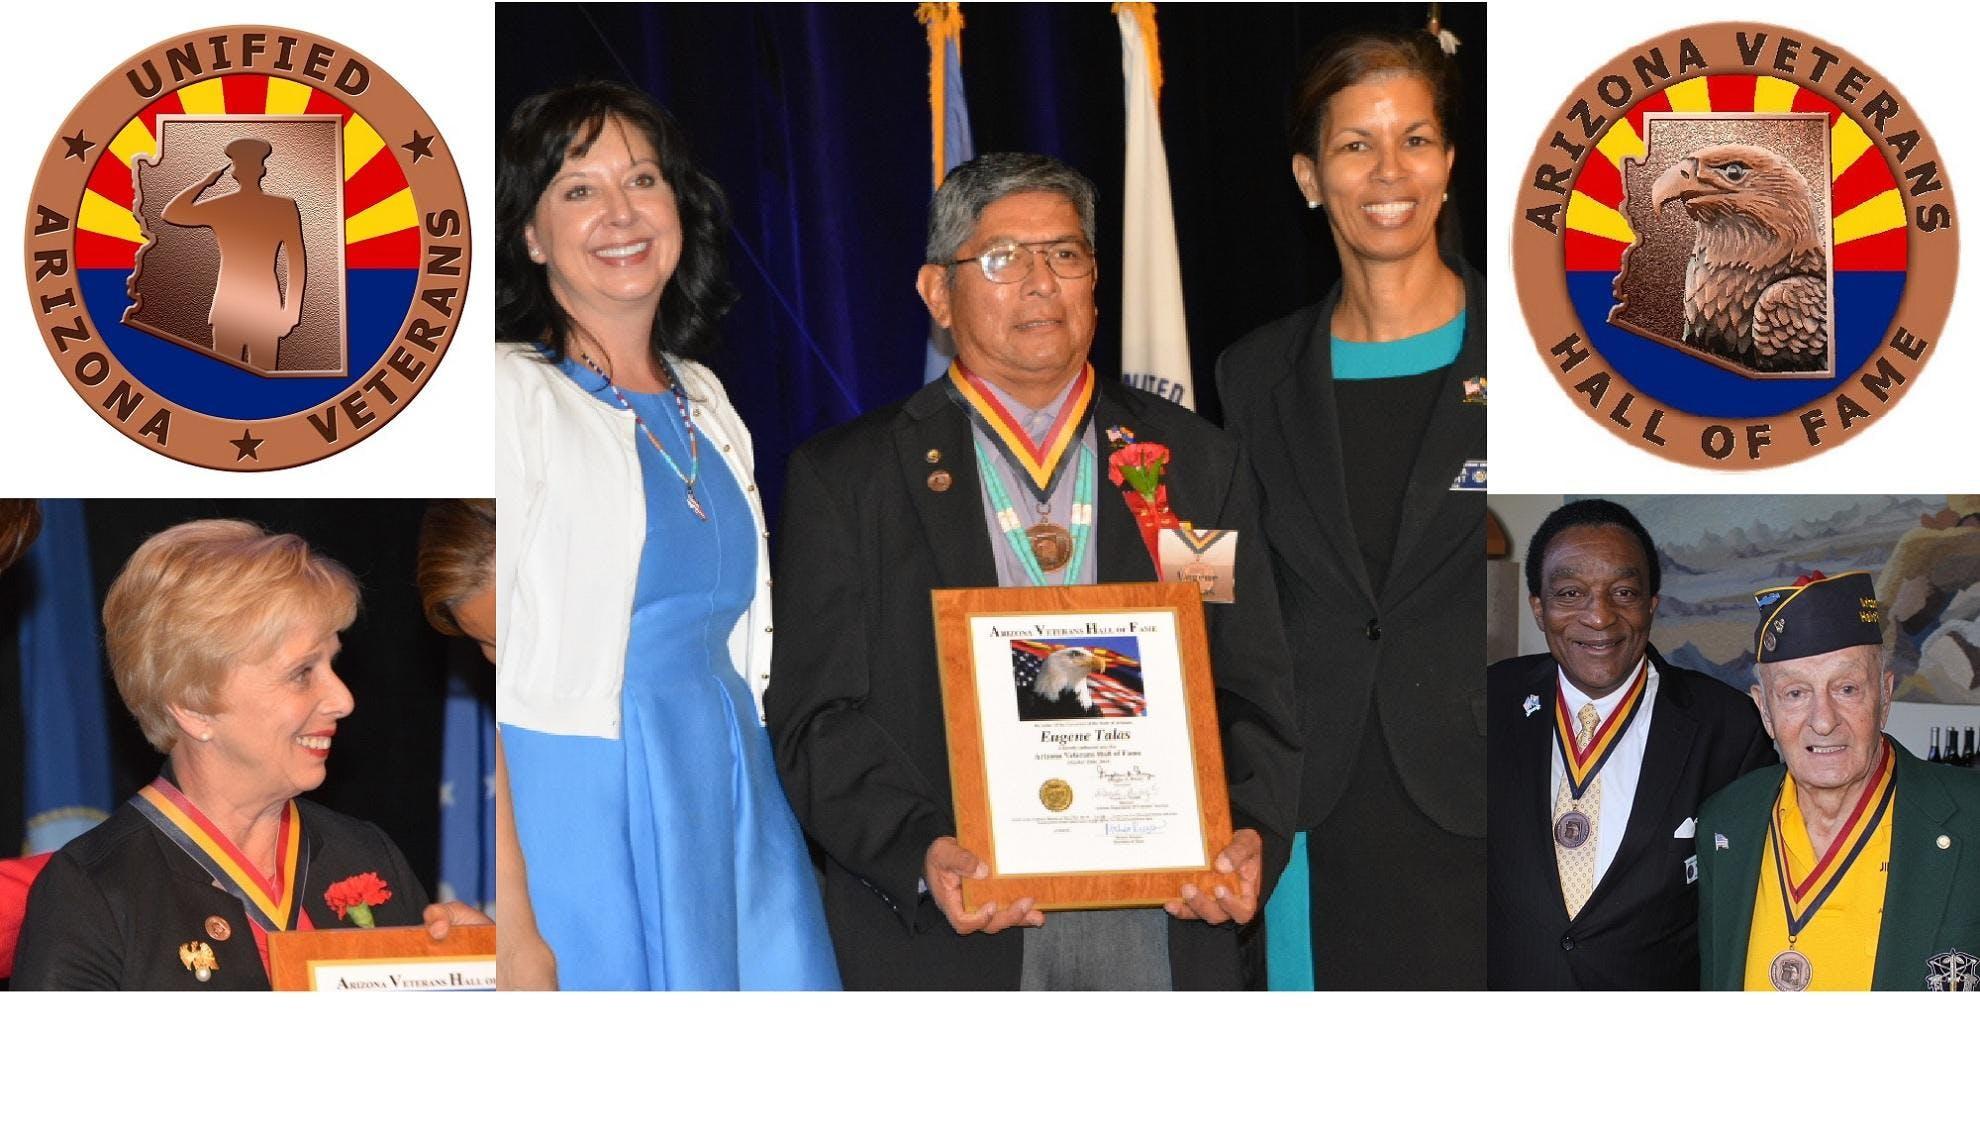 2018 Arizona Veterans Hall of Fame (AVHOF) Induction Ceremony